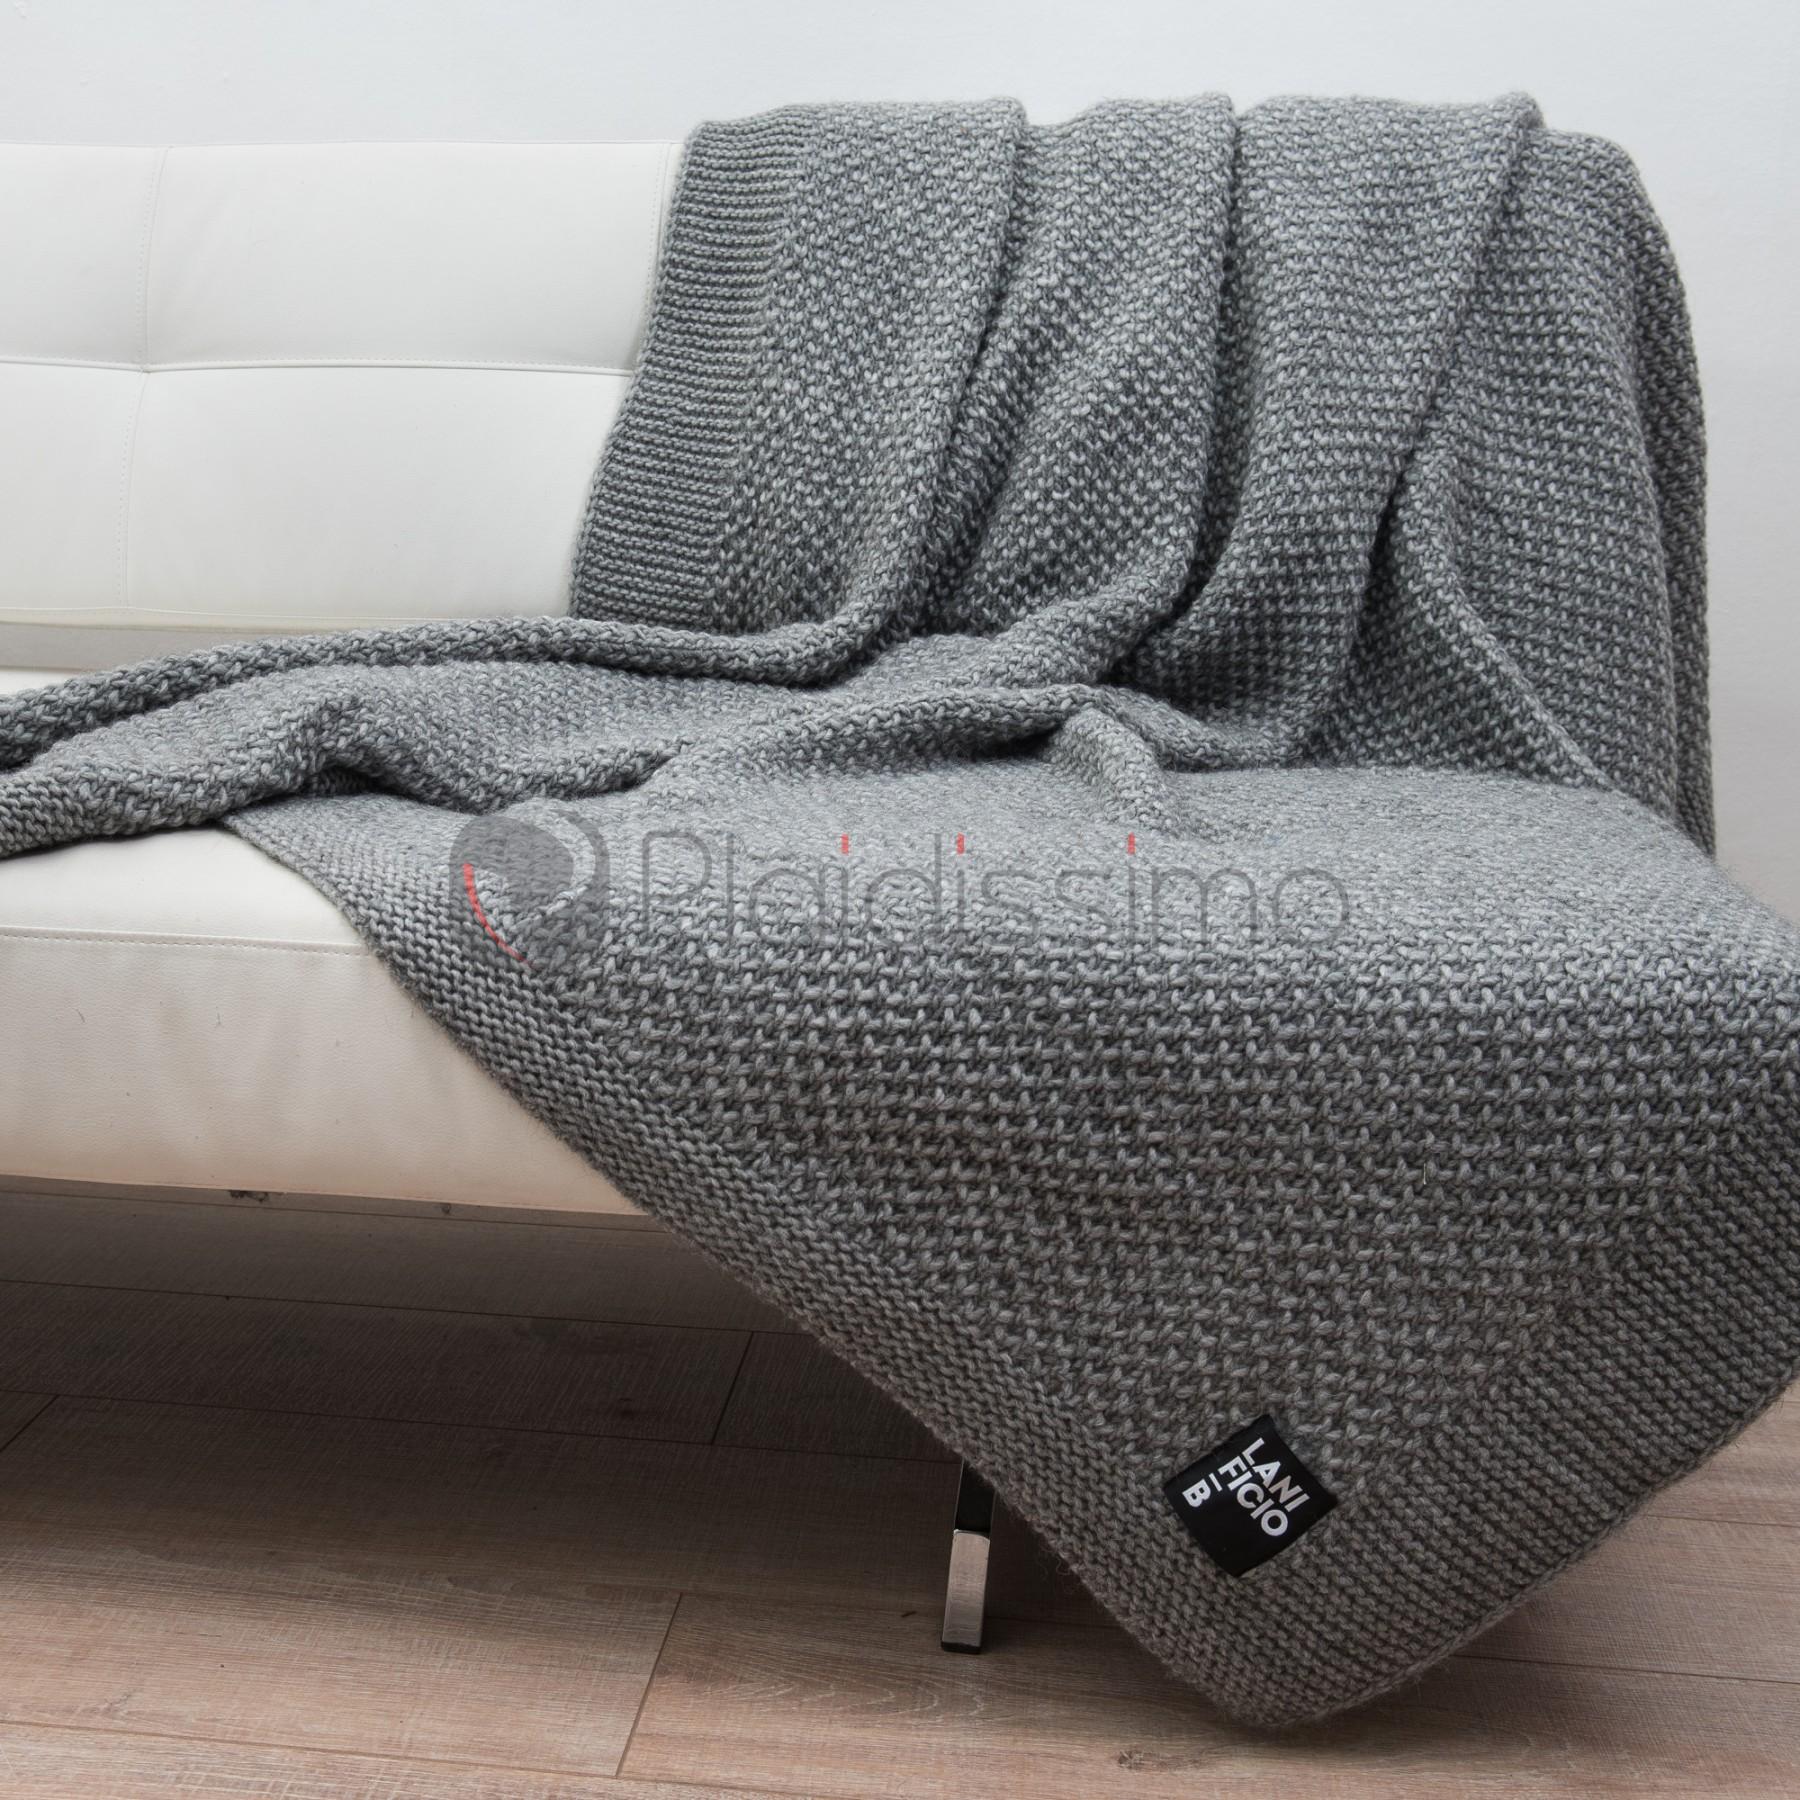 5b1e6090cc78 Plaid en Laine Vierge   Alpaga · Tricoté   Design Moderne · Knit ...